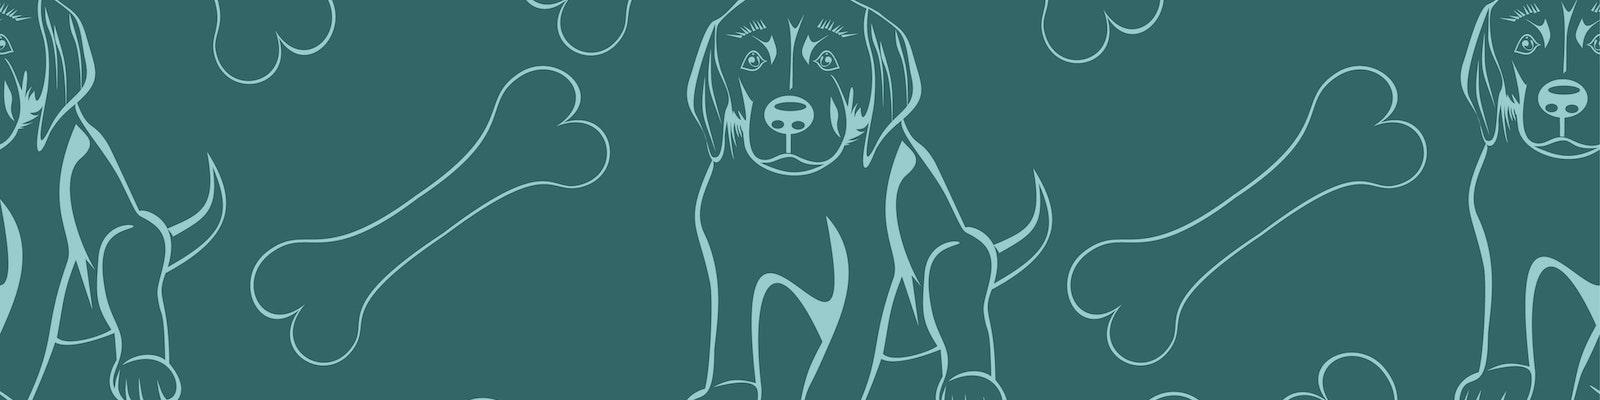 The SeeedStudio BeagleBone Green IoT Contest